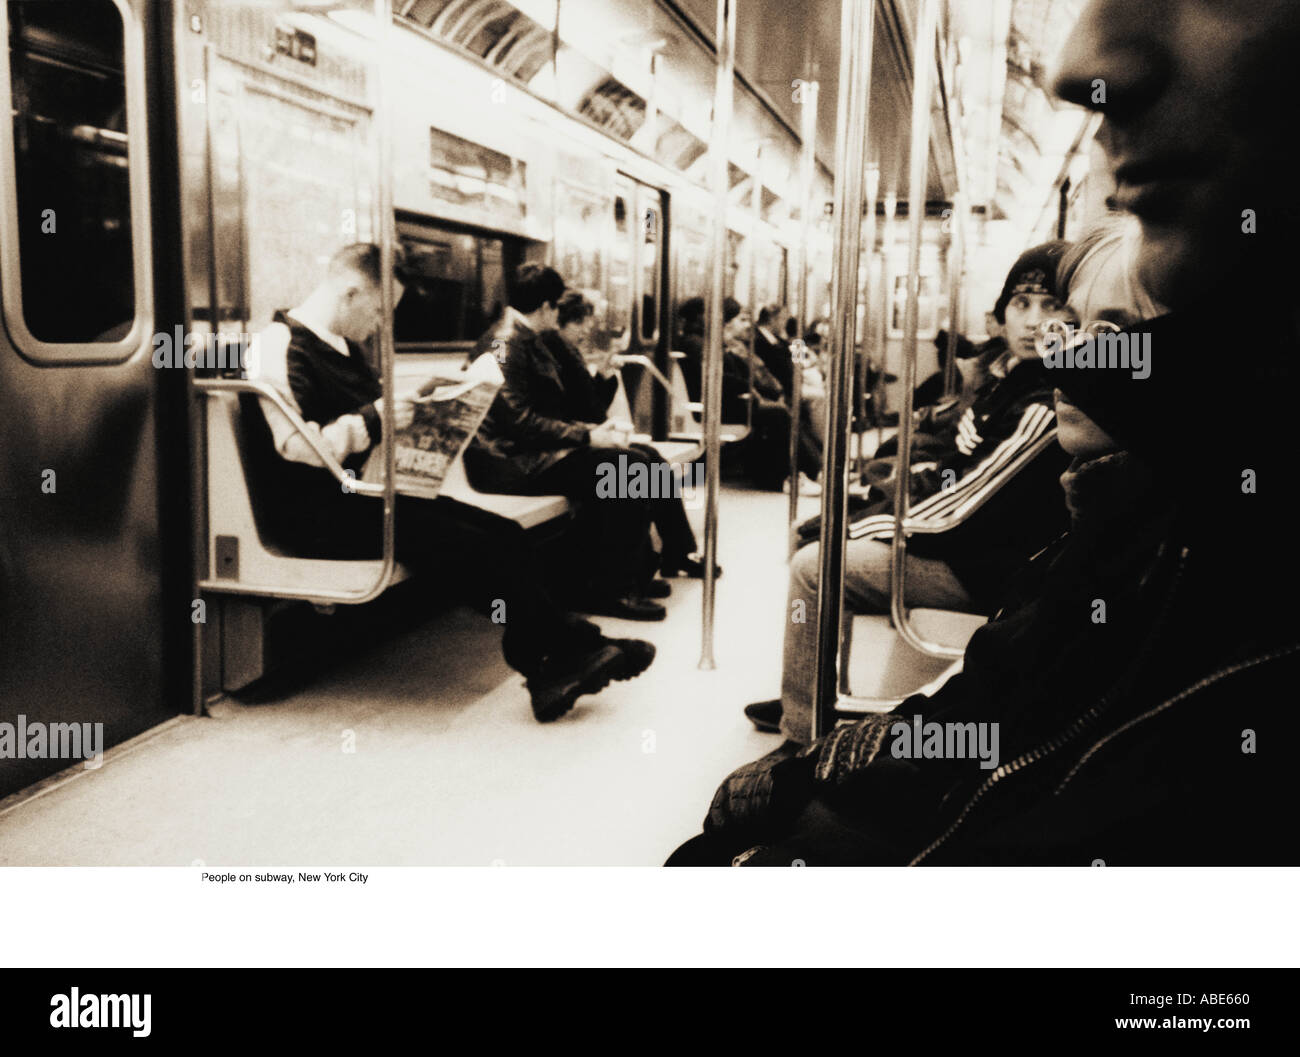 People on new york subway - Stock Image